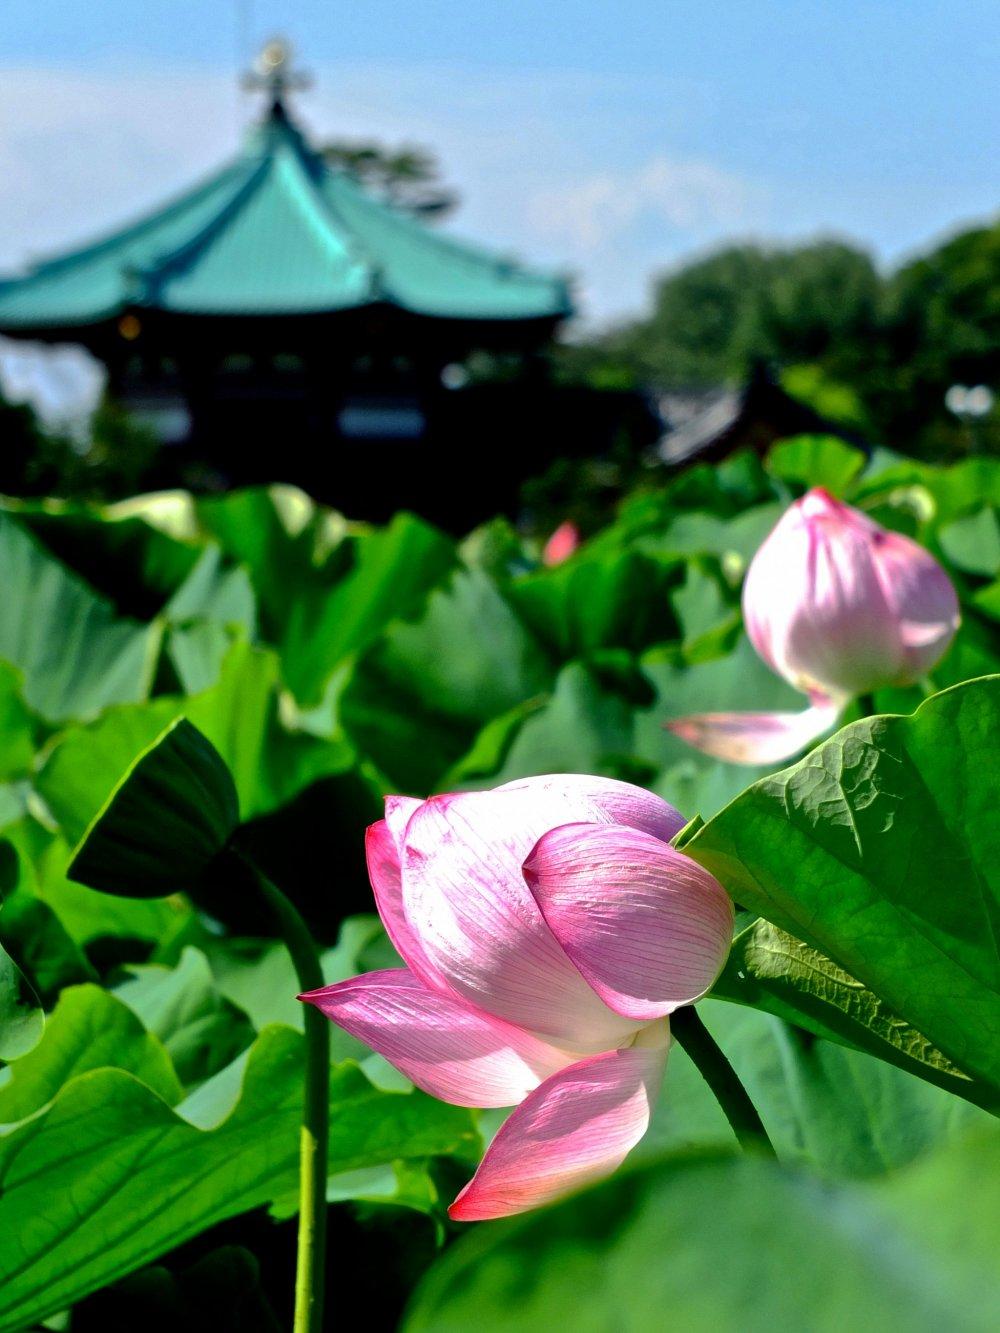 Enjoy japanese lotus at ueno park tokyo japan travel japan lotus with chinese pavilion in the background at ueno park izmirmasajfo